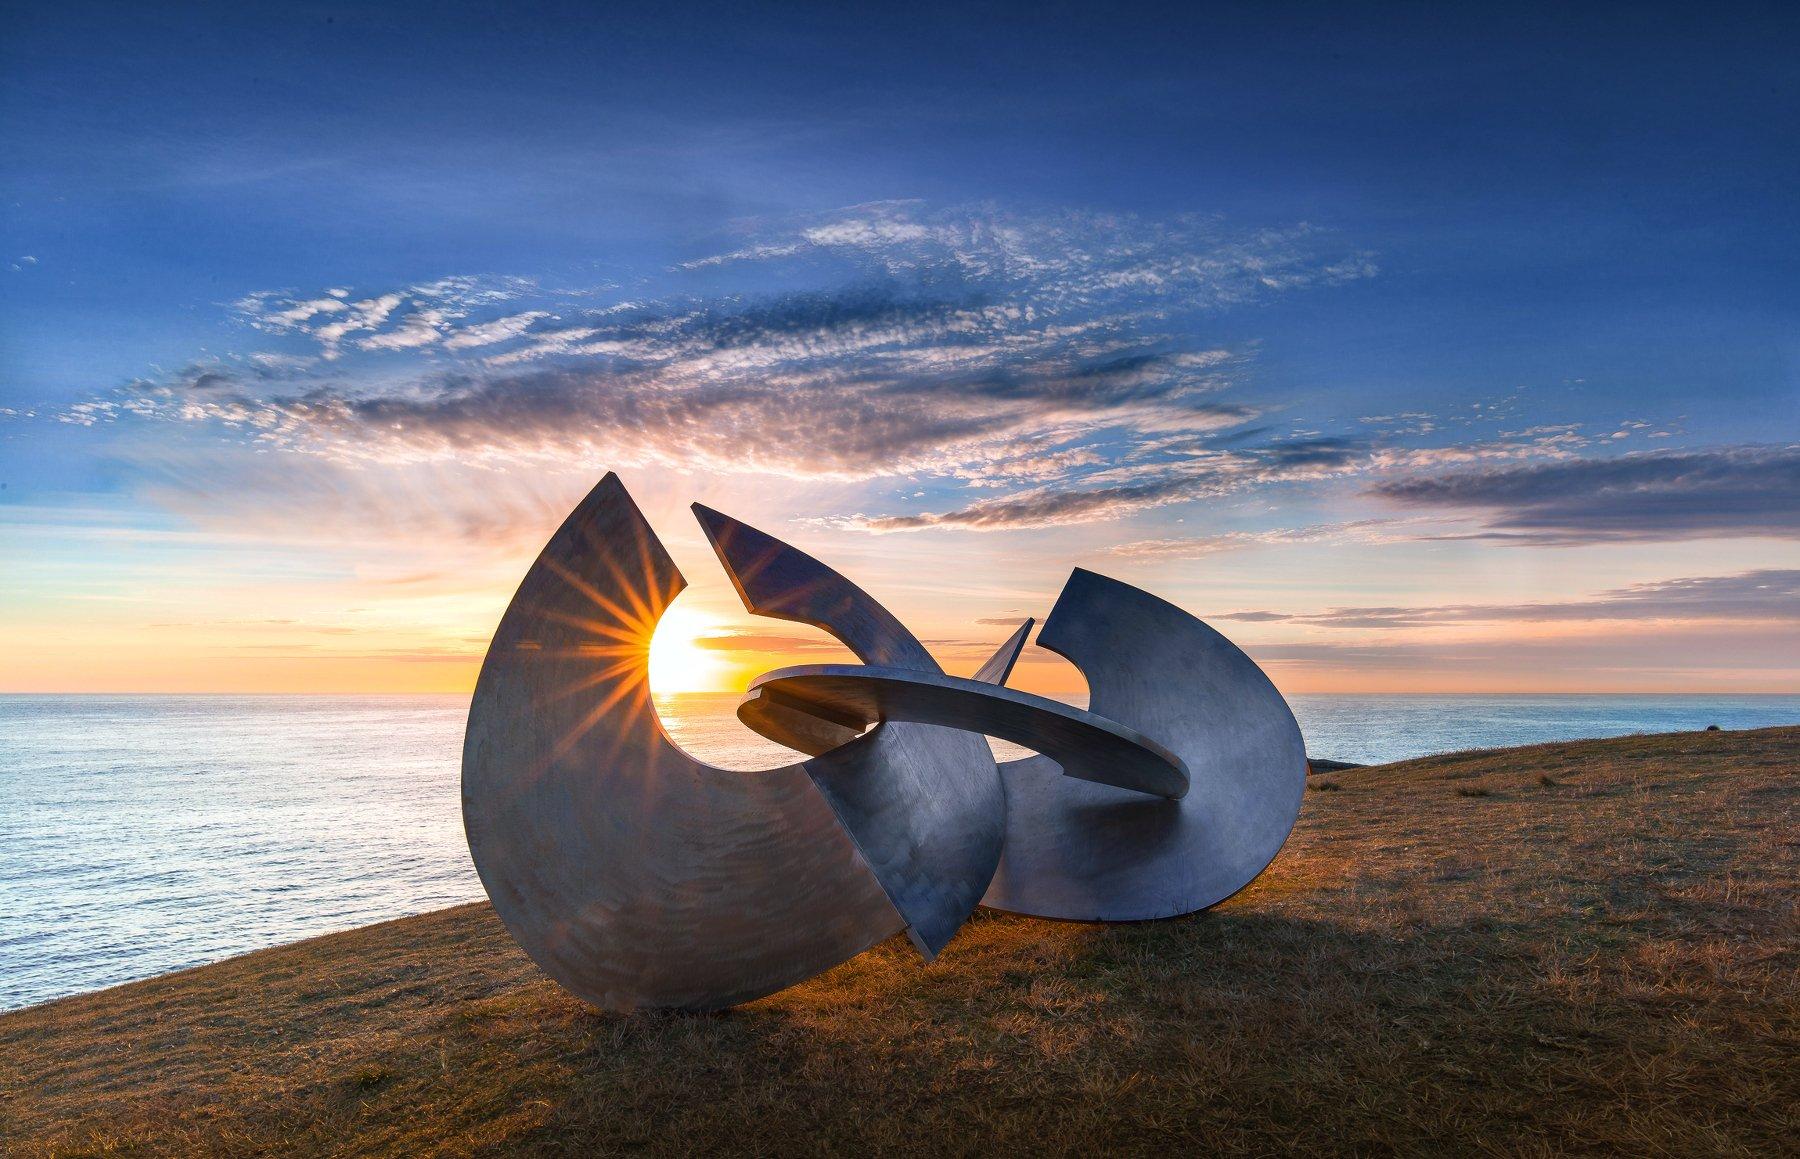 sunrise, dawn, landscape, sky, bondi beach, sculpture, sea, sunstar, Derek Zhang